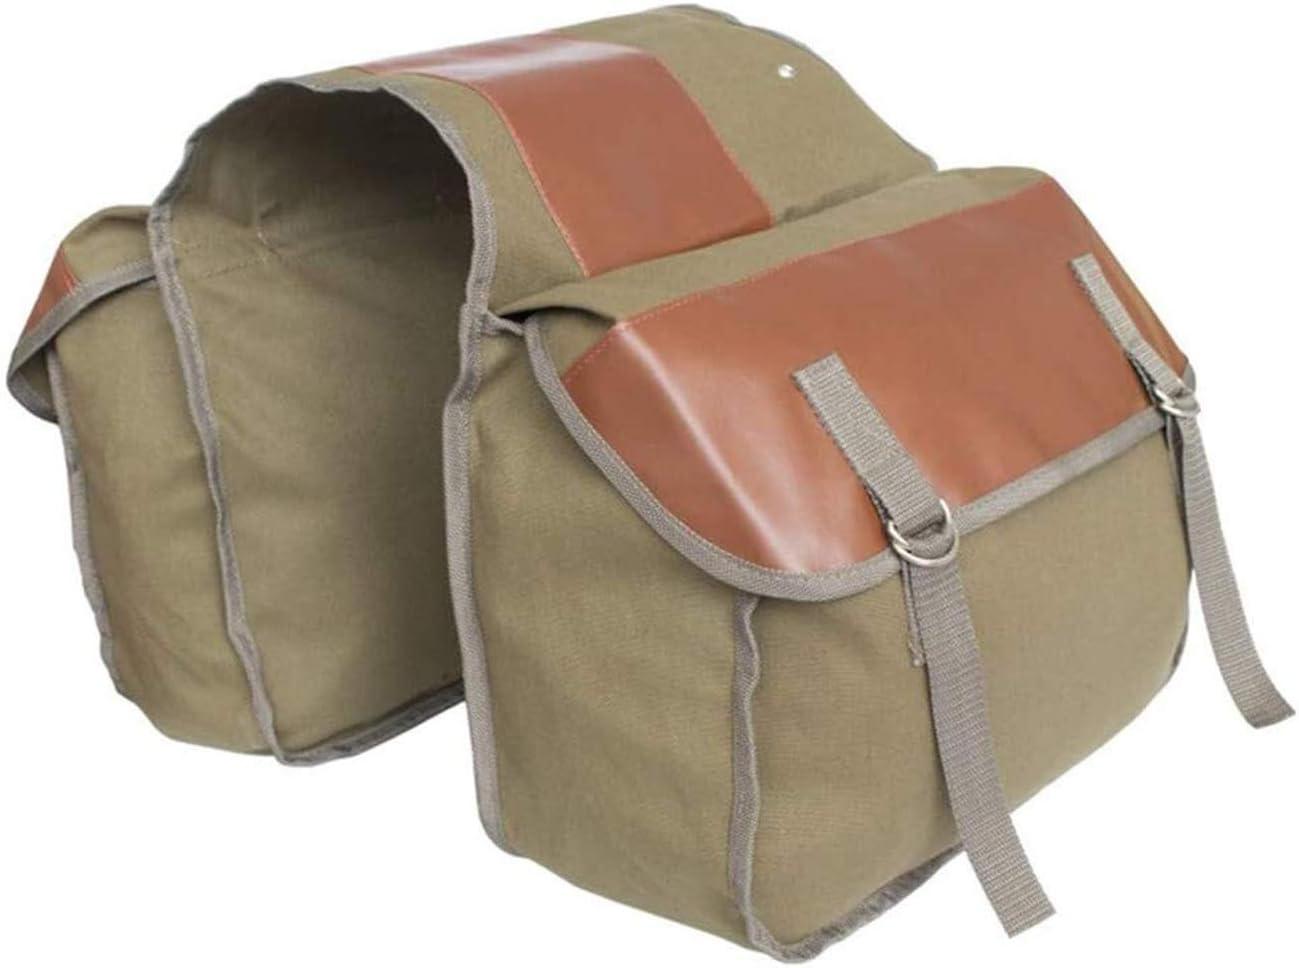 LIUXIN Saddle Bags Waterproof Pannier Bag Doub Bike Panniers for Sacramento Houston Mall Mall